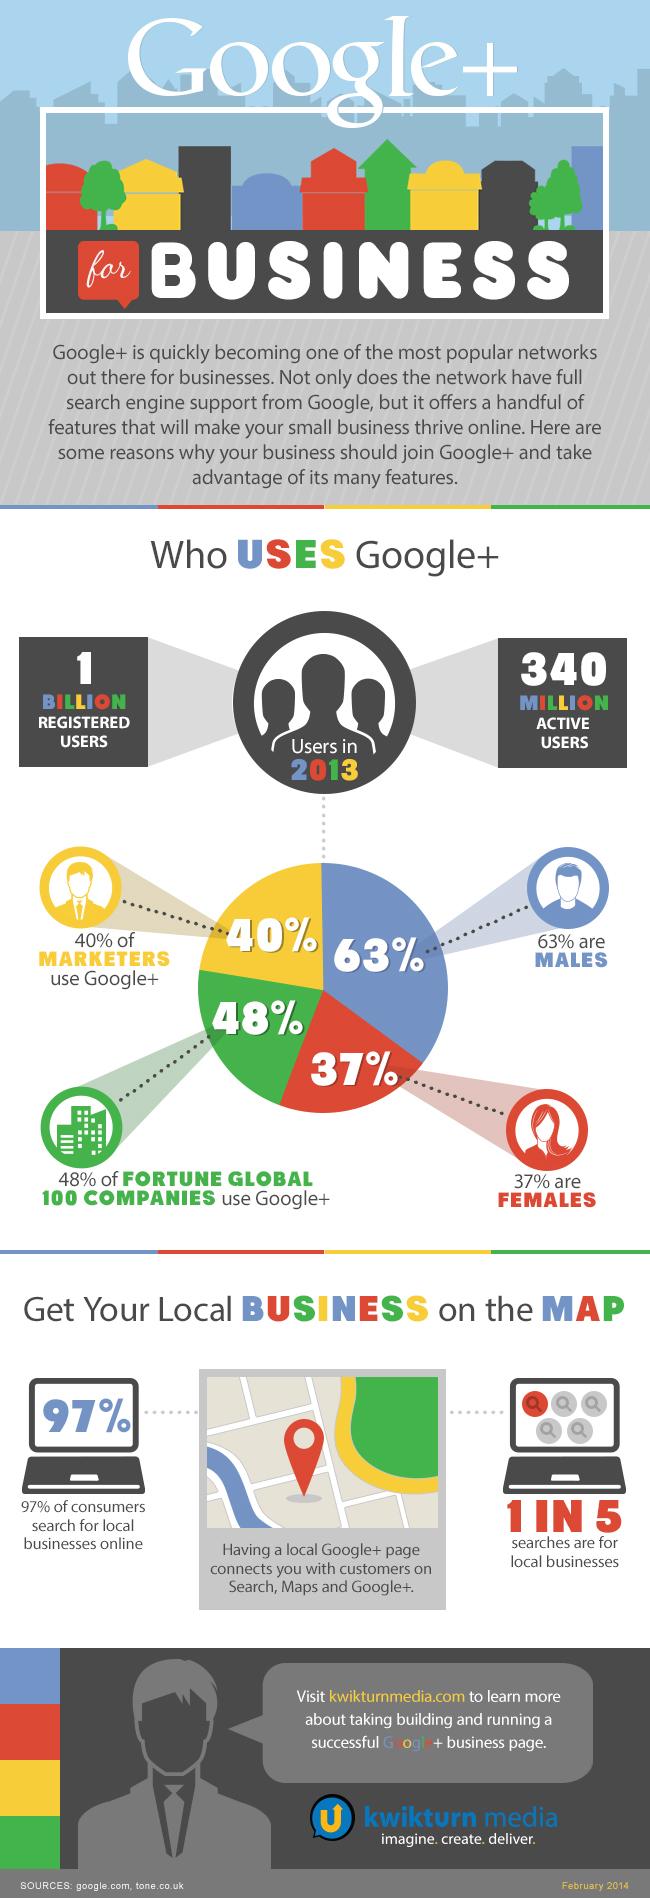 Cómo usar Google + para empresas